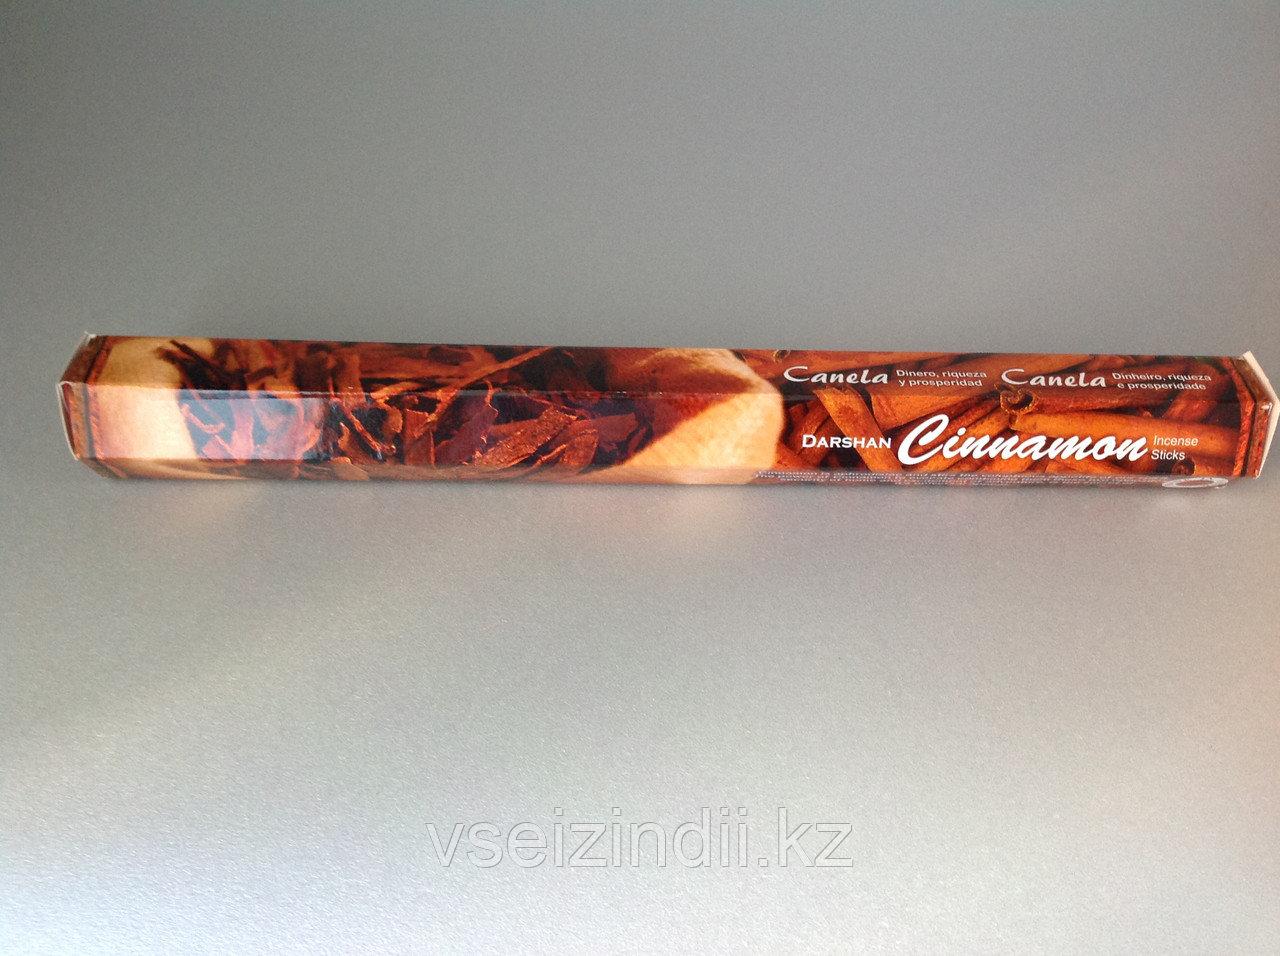 Благовония угольные Cinnamon (Корица), Darshan, 20 шт